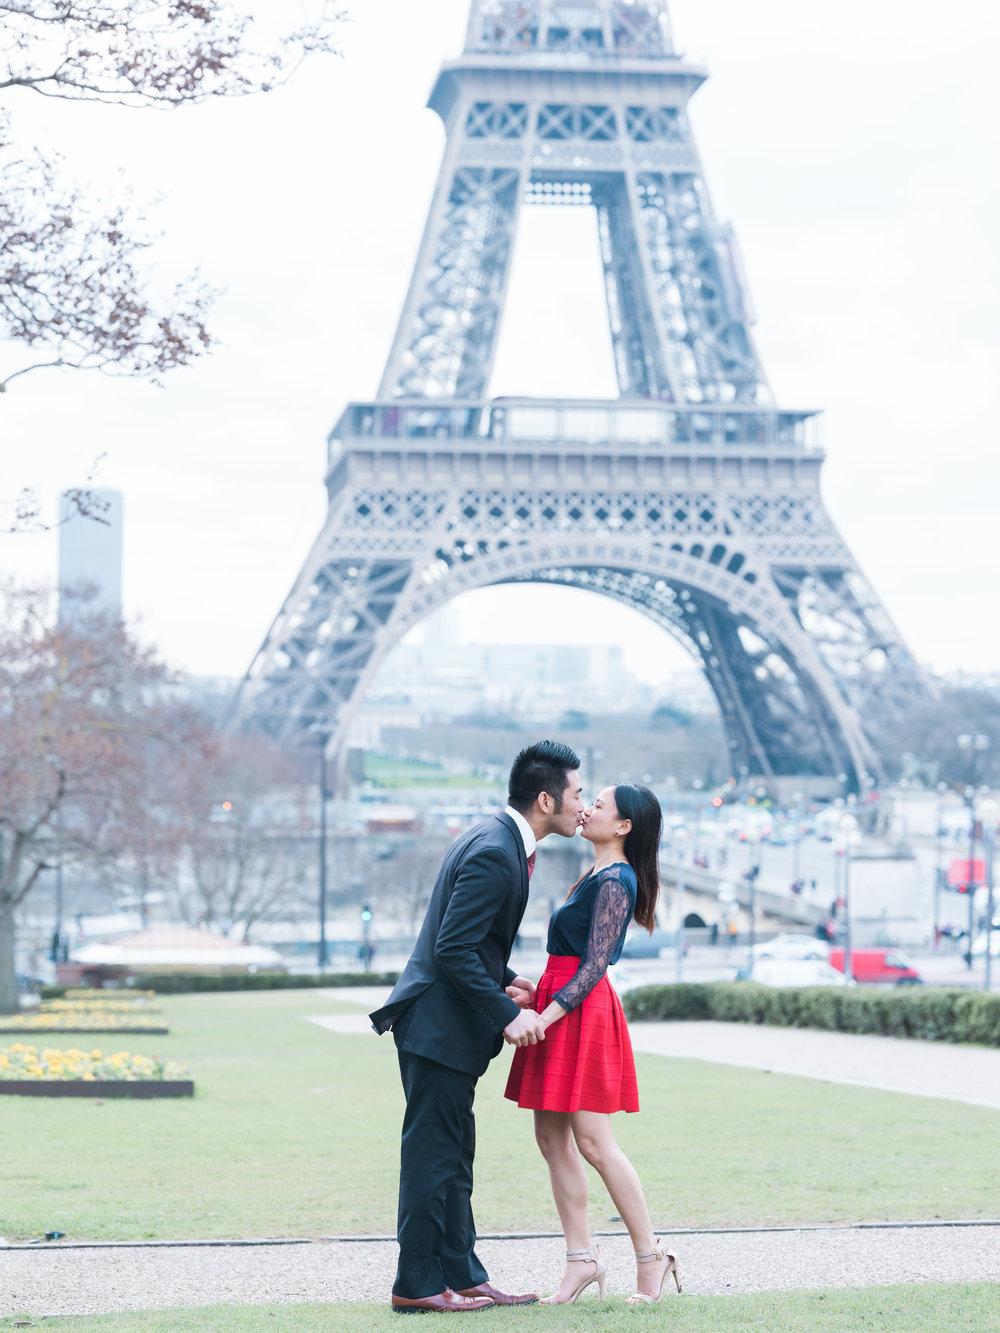 romantic eiffel tower couples engagement photo session in paris france